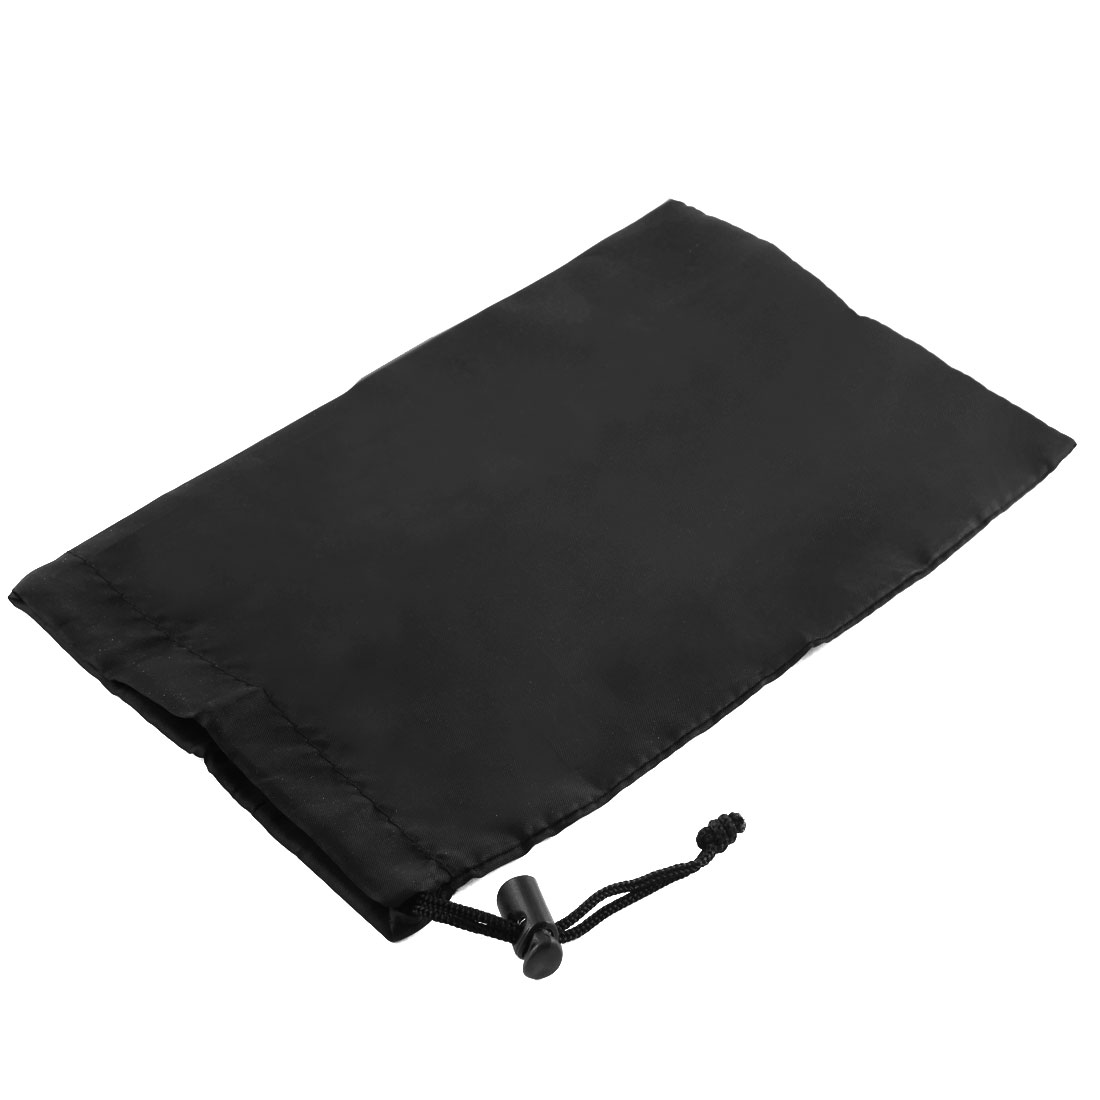 Home Black Nylon Folded Clothes Storage Drawstring Bag 22 x 14cm